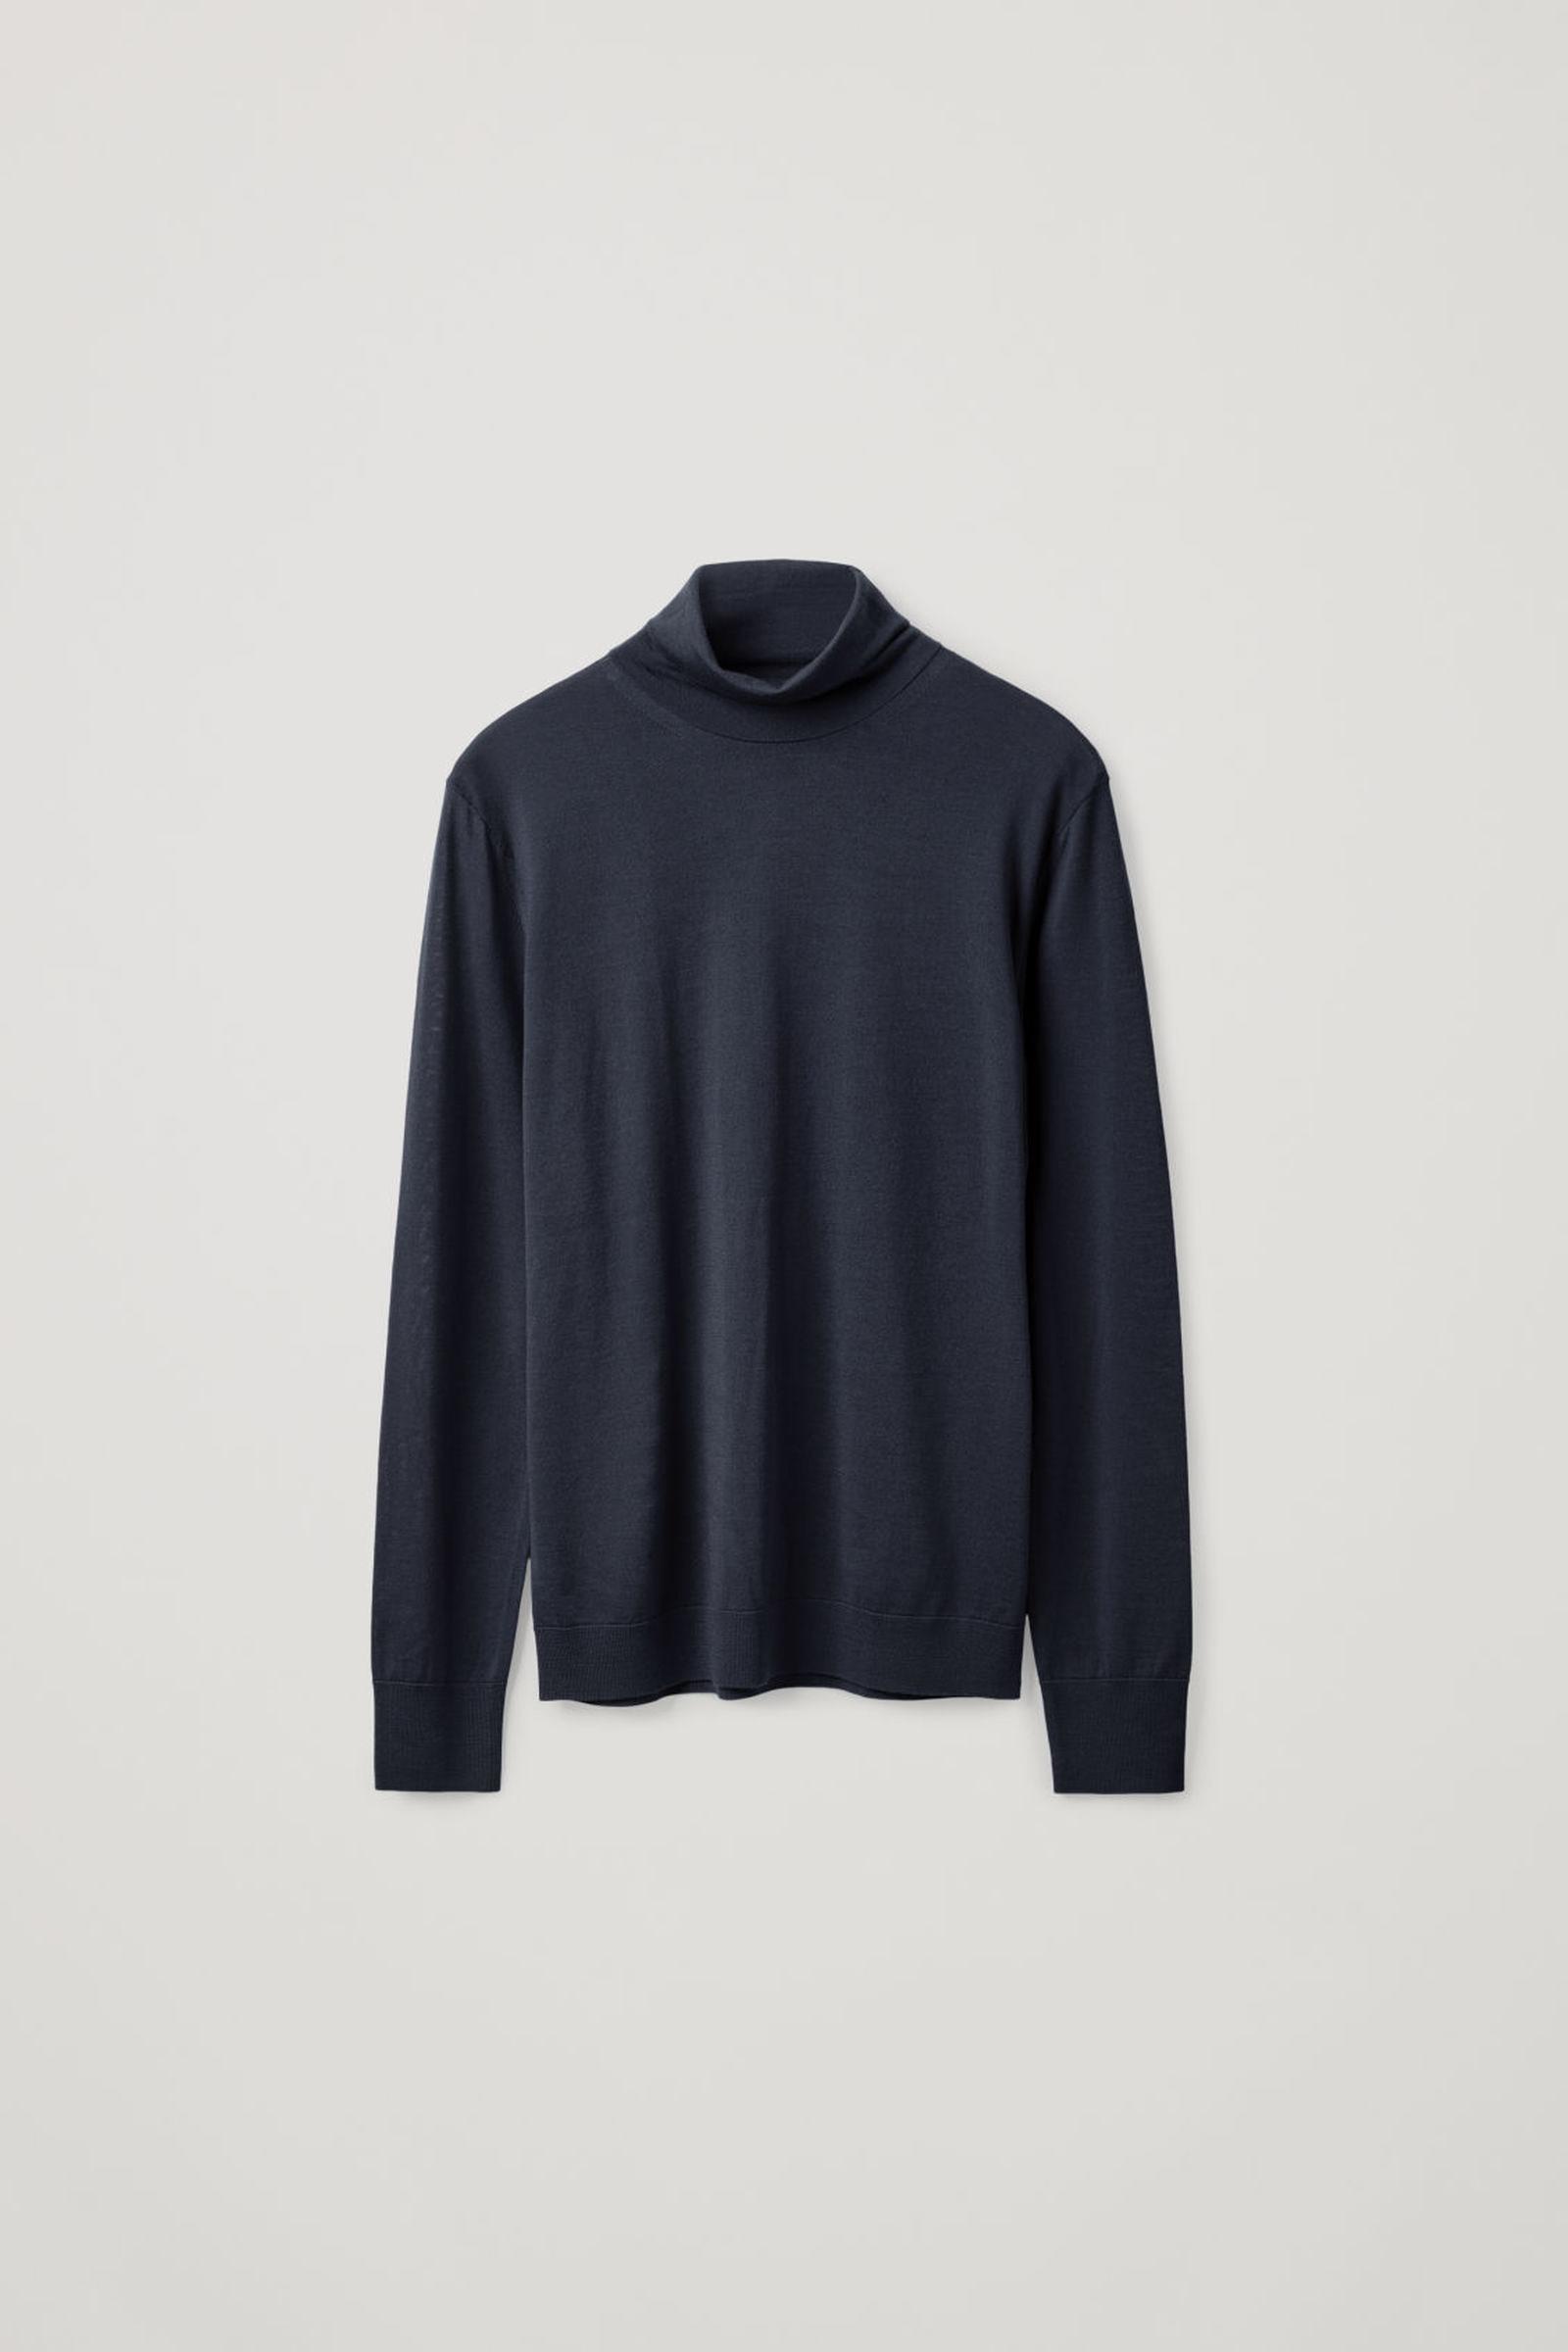 COS 메리노 롤넥 스웨터의 네이비컬러 Product입니다.